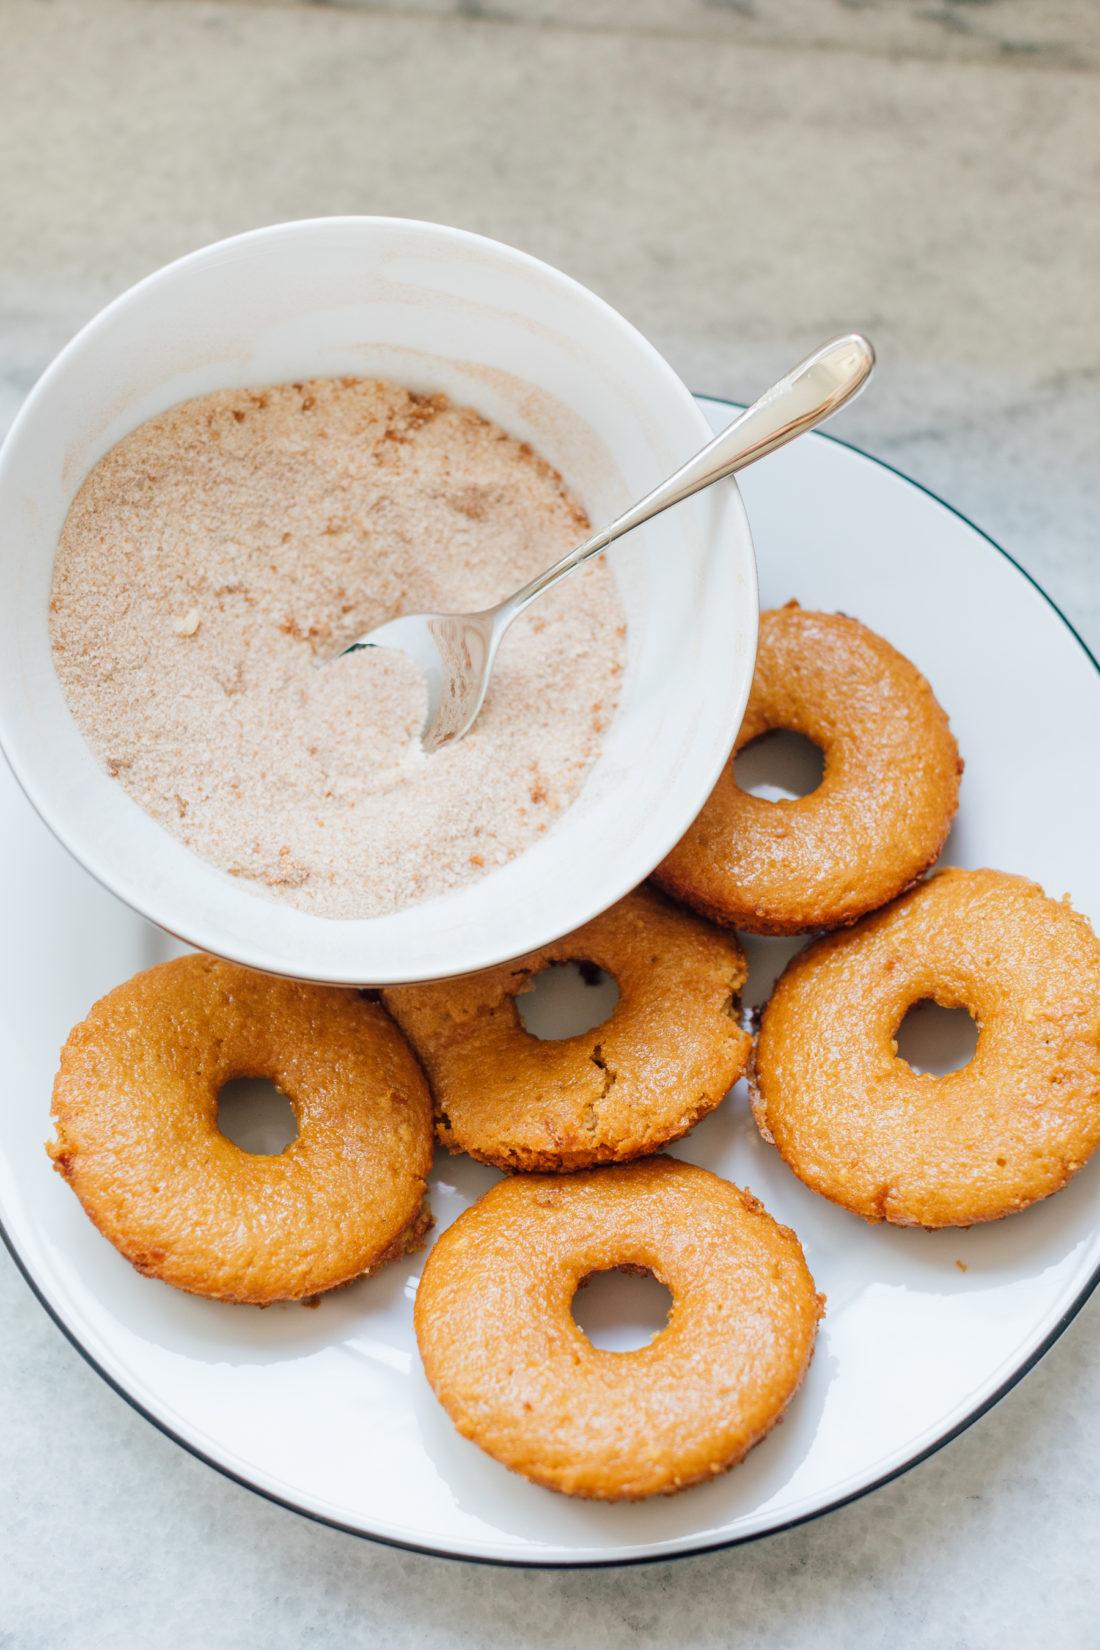 Eva Amurri Martino shares her recipe for delish baked apple cider donuts